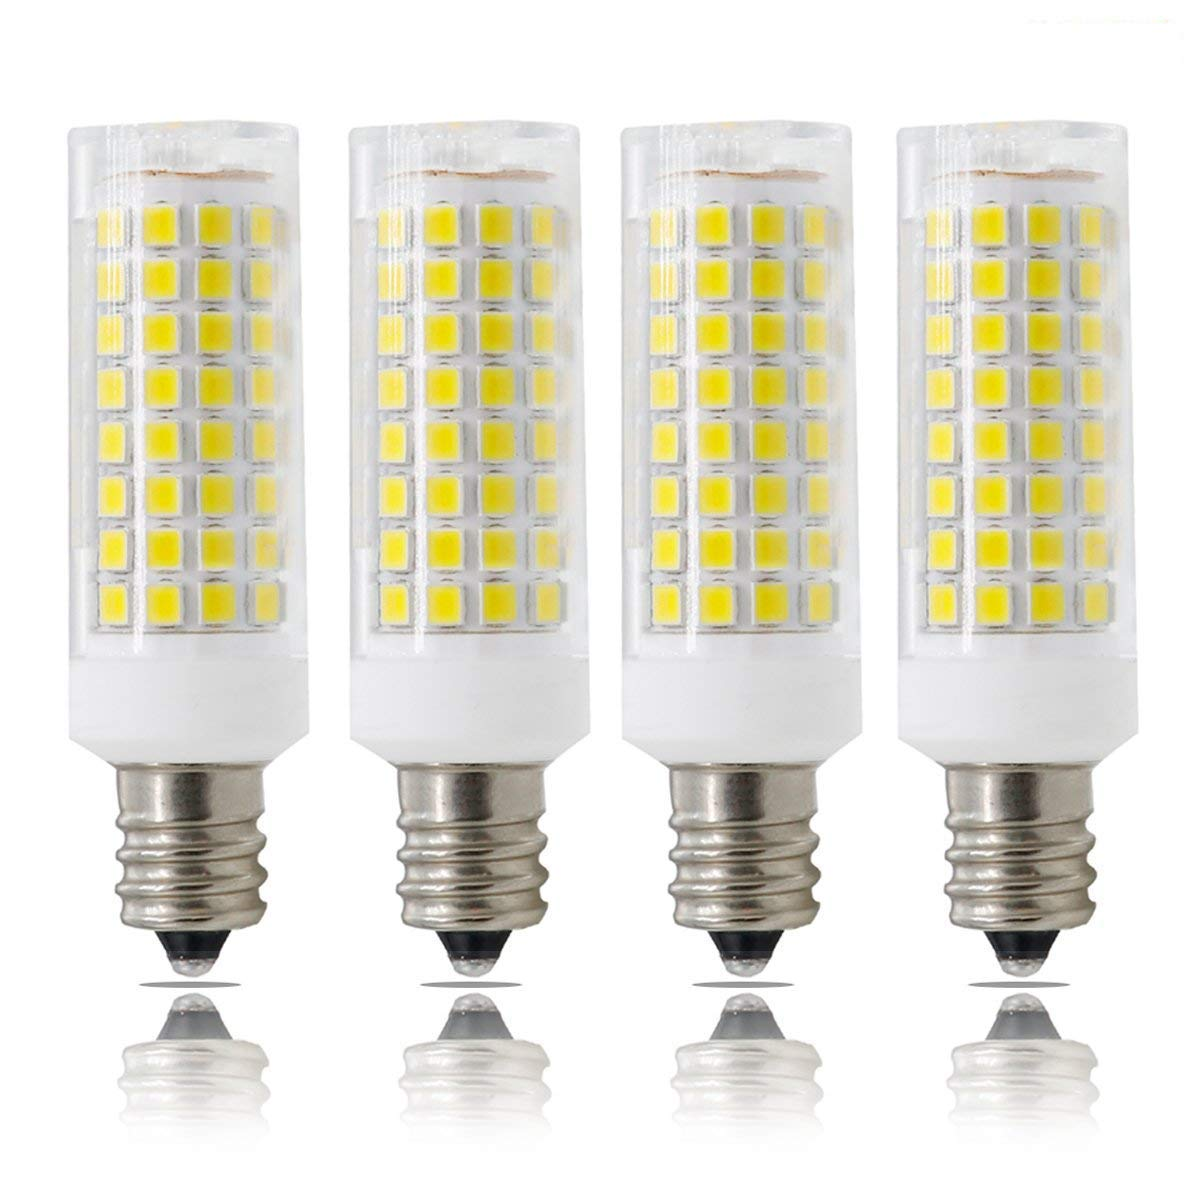 E12 LED, Dimmable Candelabra Base E12 Bulbs, ALL-NEW(102PCS), 7W E12 Led Bulb 75W Equvilent,730LM, 360 Degree Beam Angle T3/T4 Candelabra Base Corn Bulb, AC110-130V, 4-PACK (White)